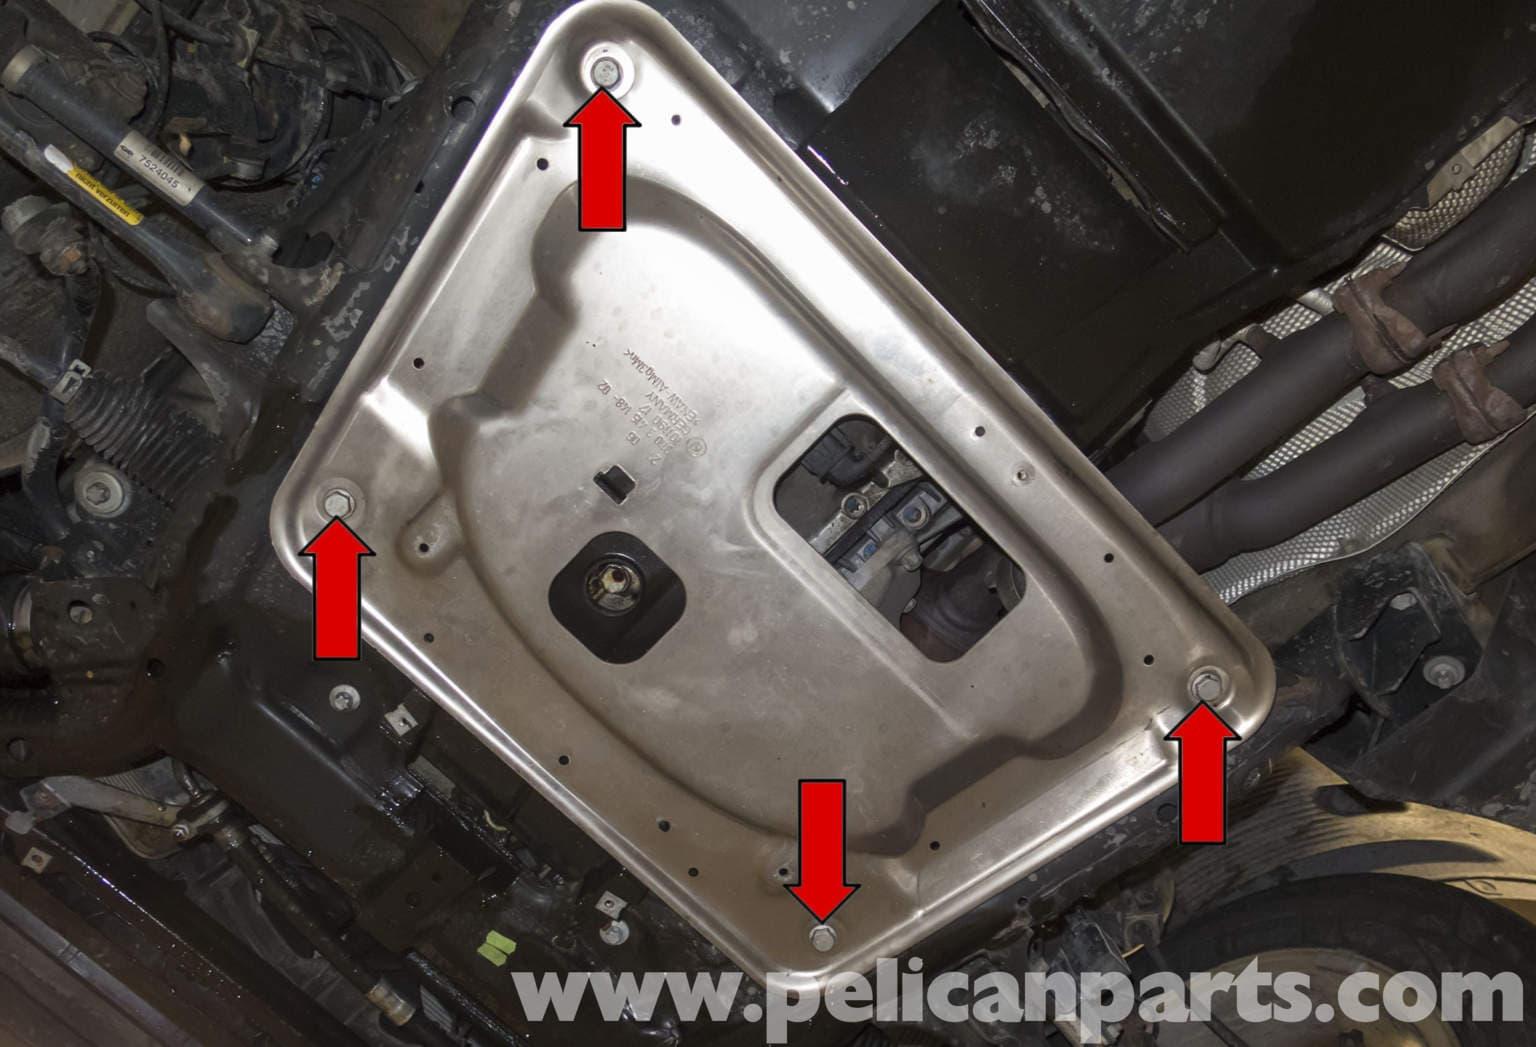 Pelican Parts Technical Article - BMW-X3 - Engine Splash ...